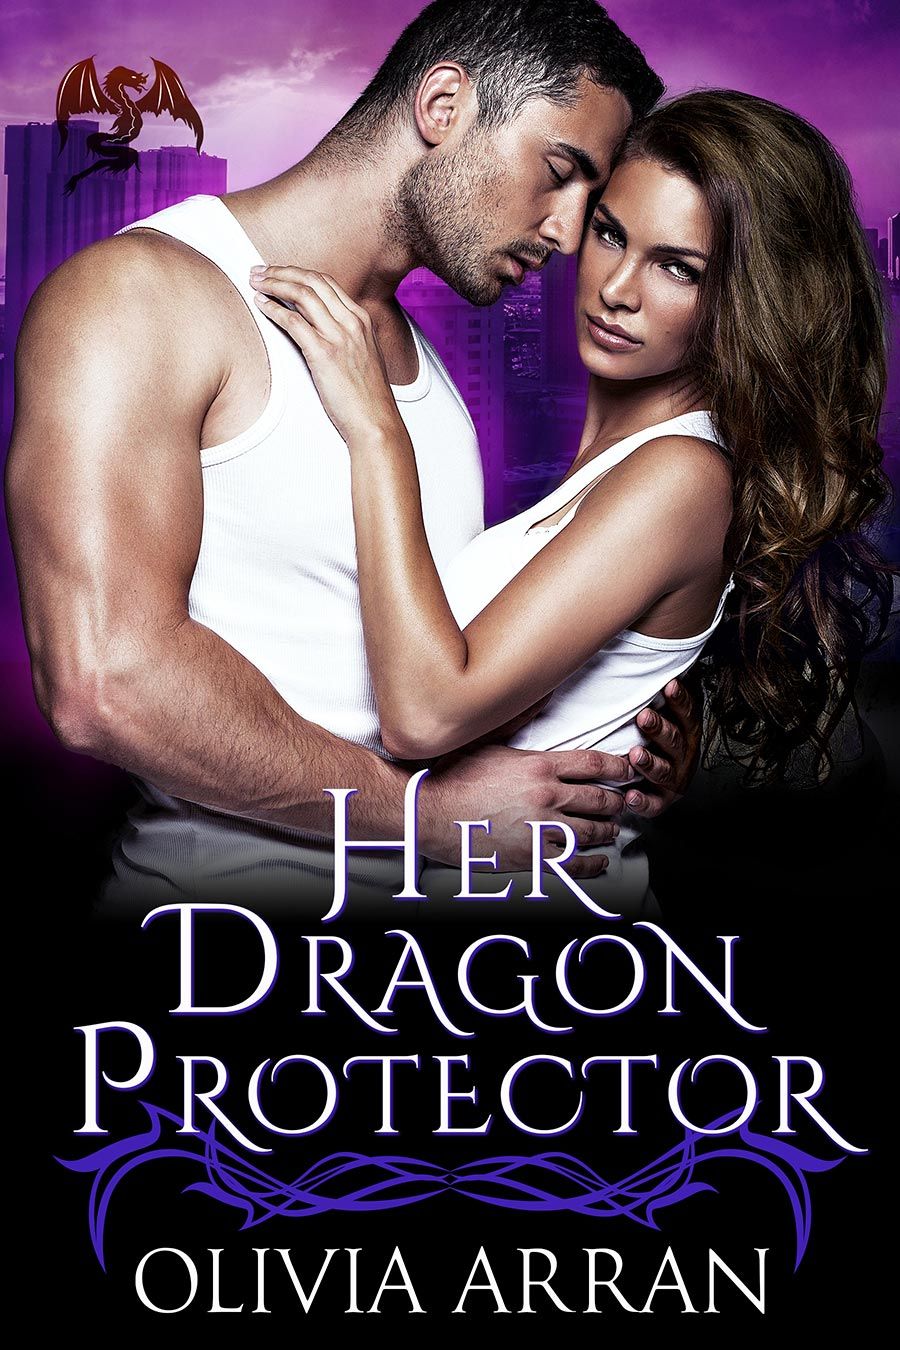 Her-Dragon-Protectors---Olivia-Arran---Watcher---with-purple-text-shadow.jpg